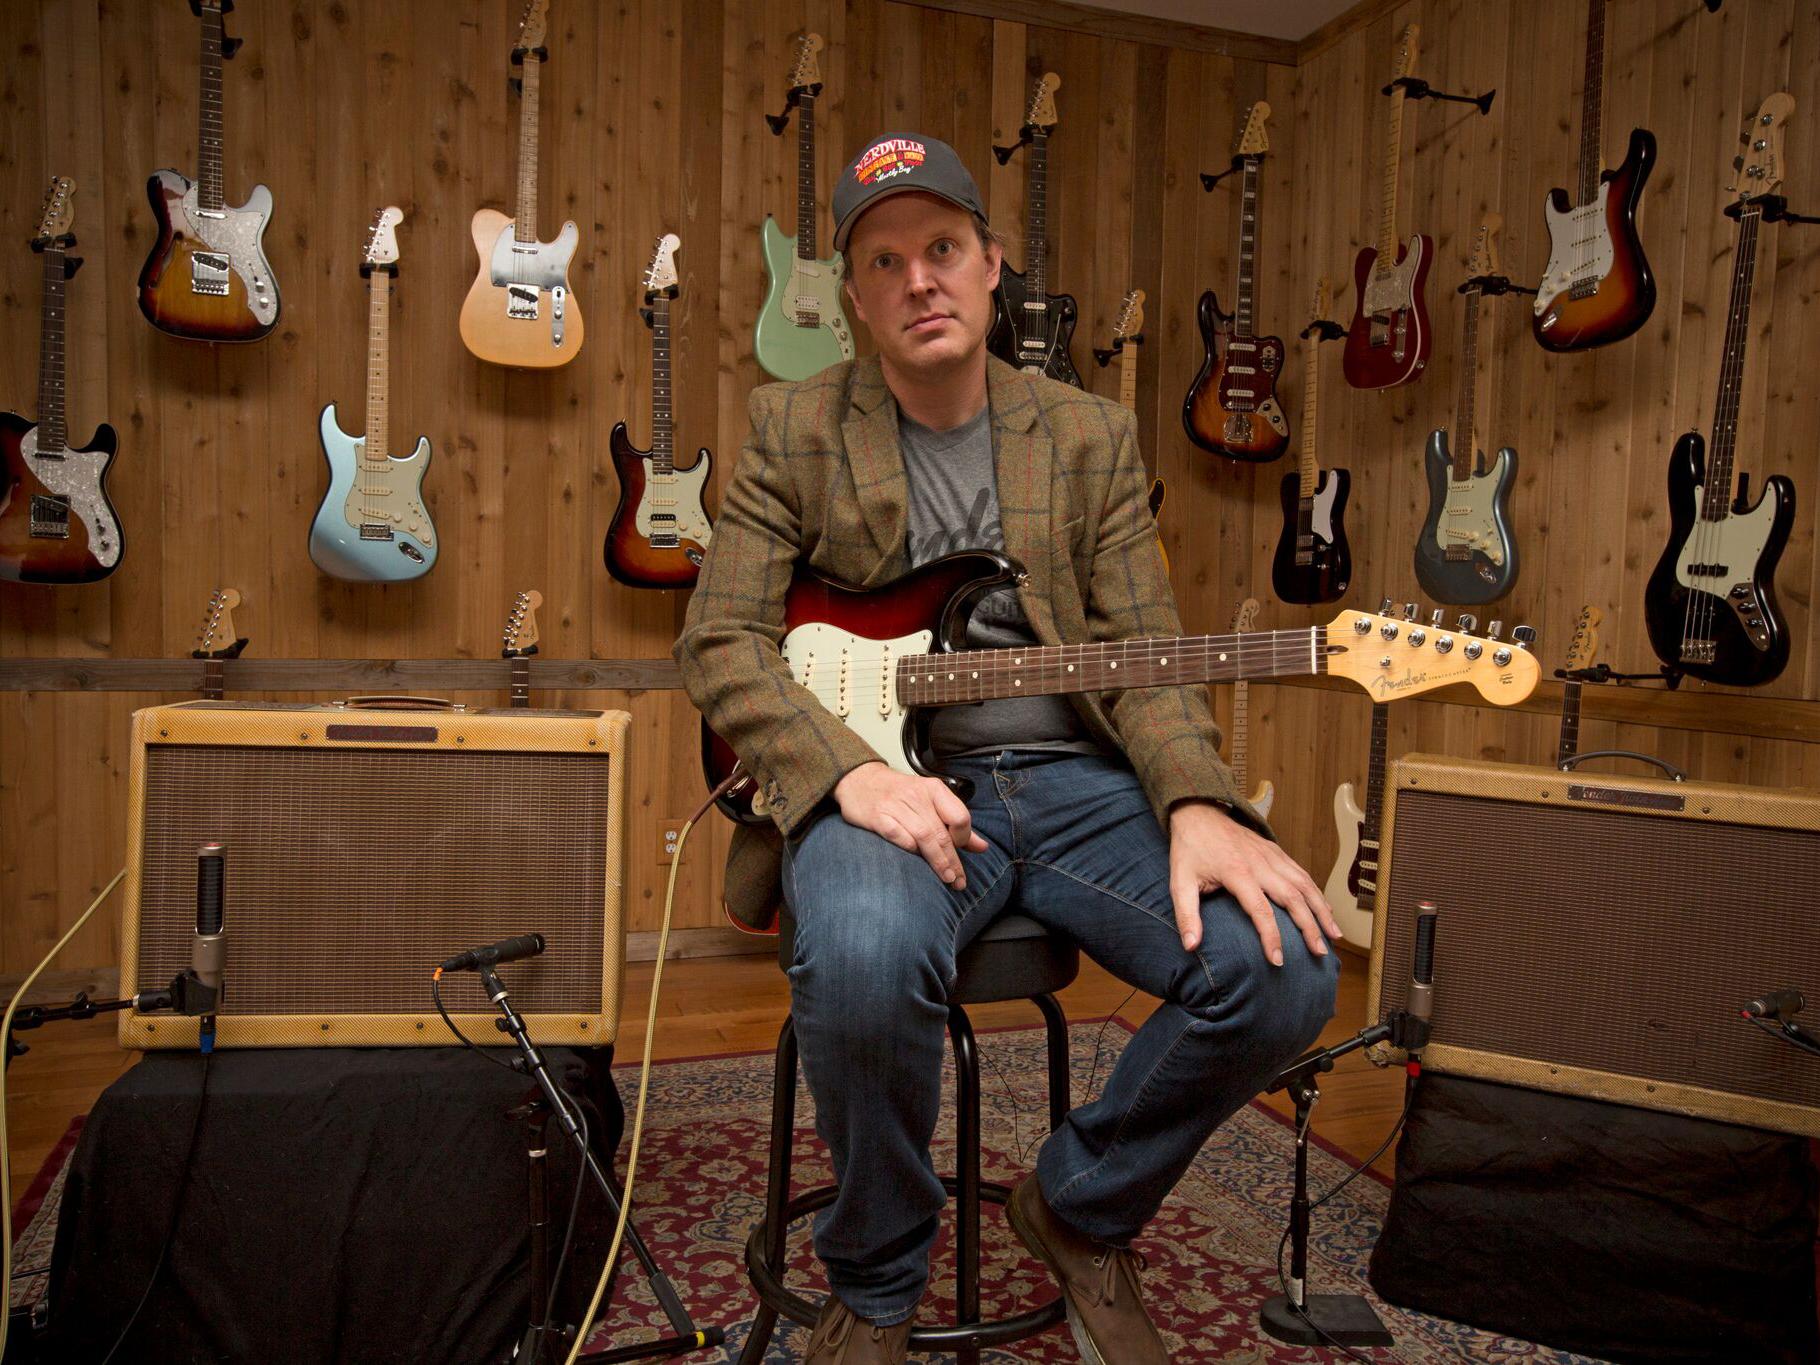 Joe Bonamassa has a new signature Fender amp